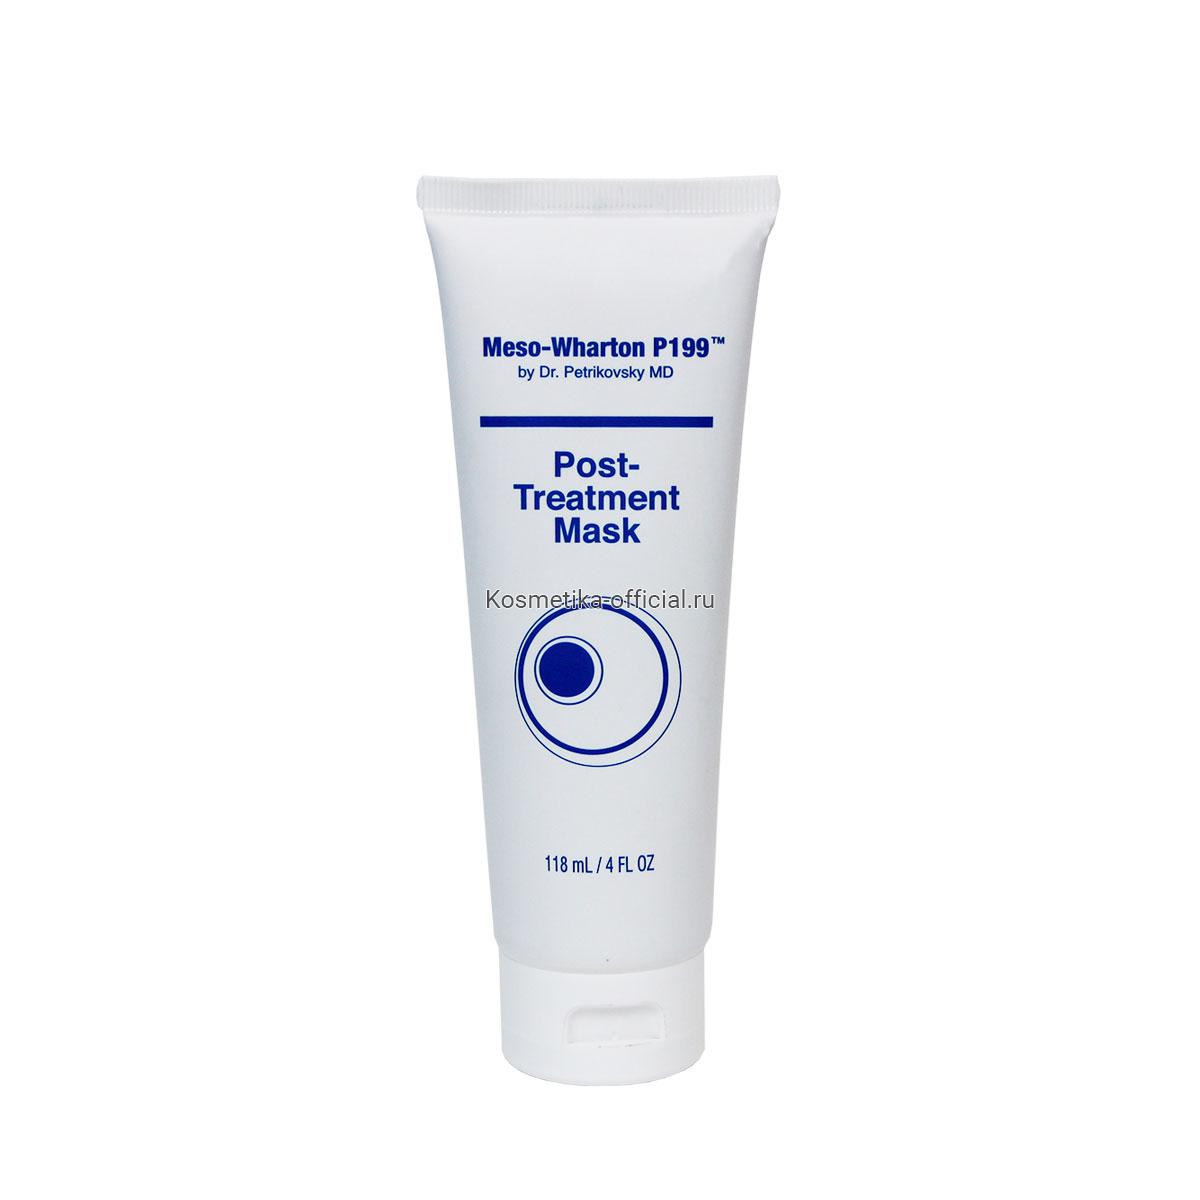 Маска восстанавливающая Мезовартон Post-Treatment Mask by Dr. Petrikovsky MD Meso-Wharton P199™ 118 мл